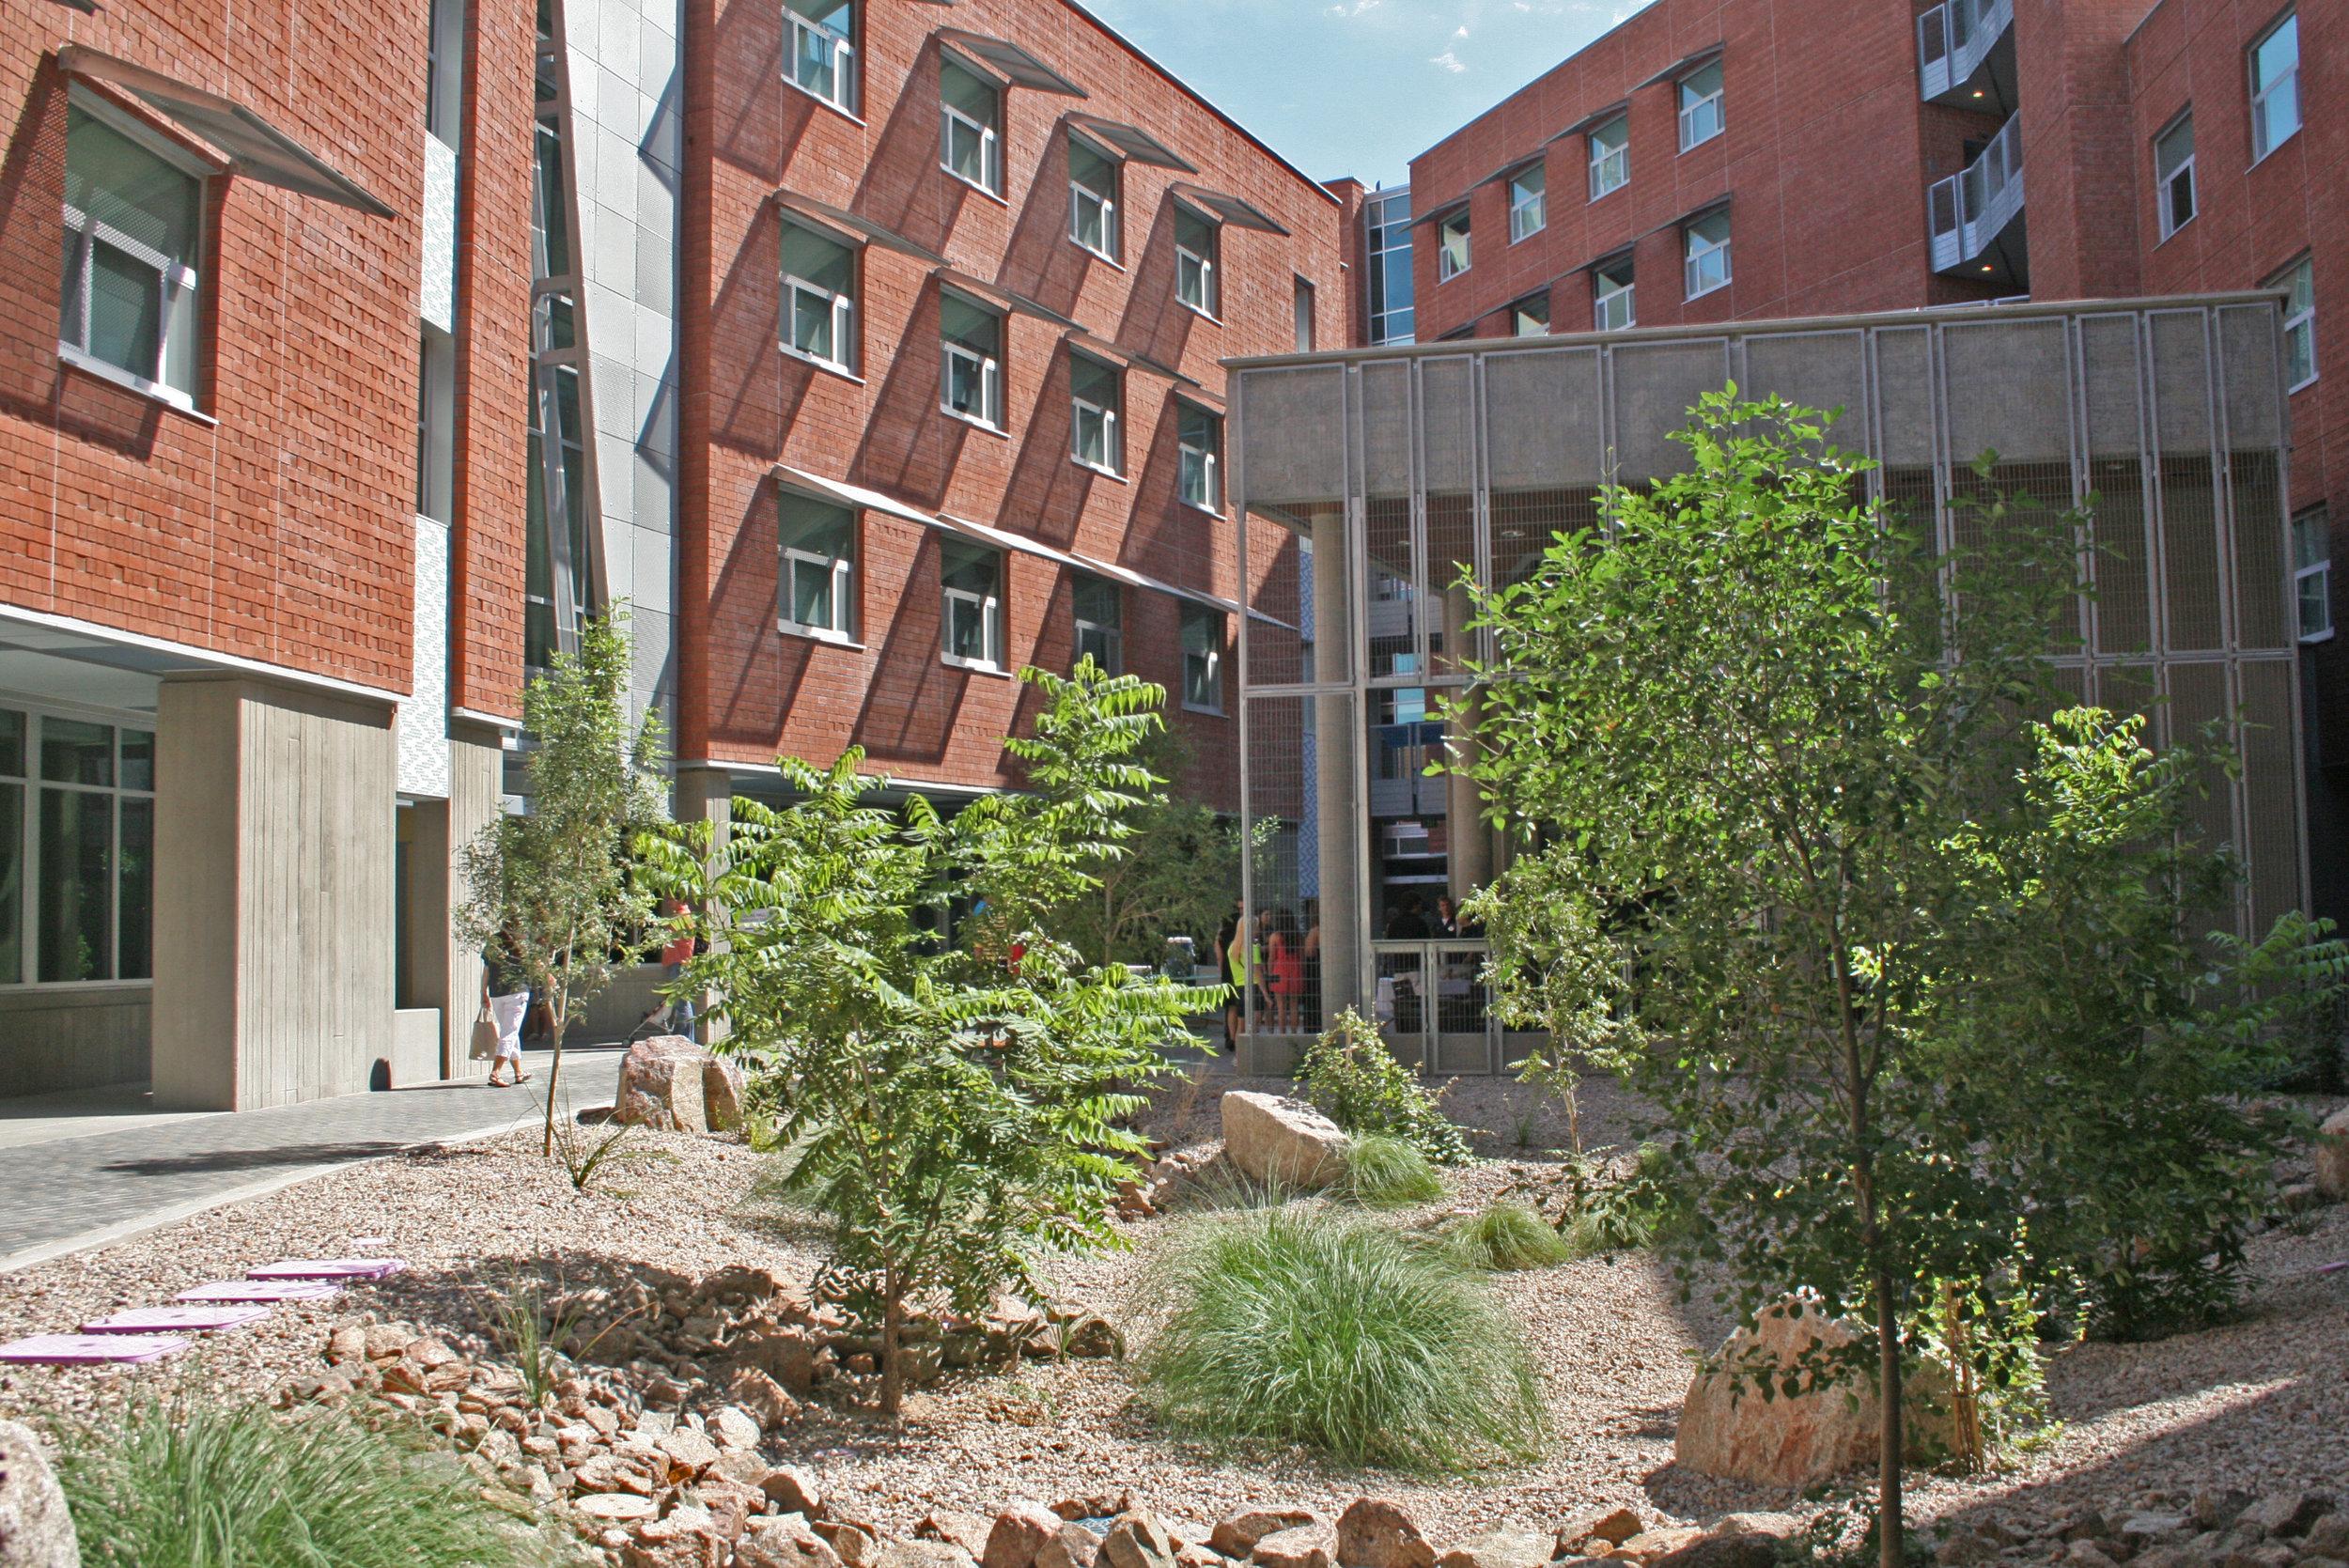 University of Arizona 6th Street Residence Halls